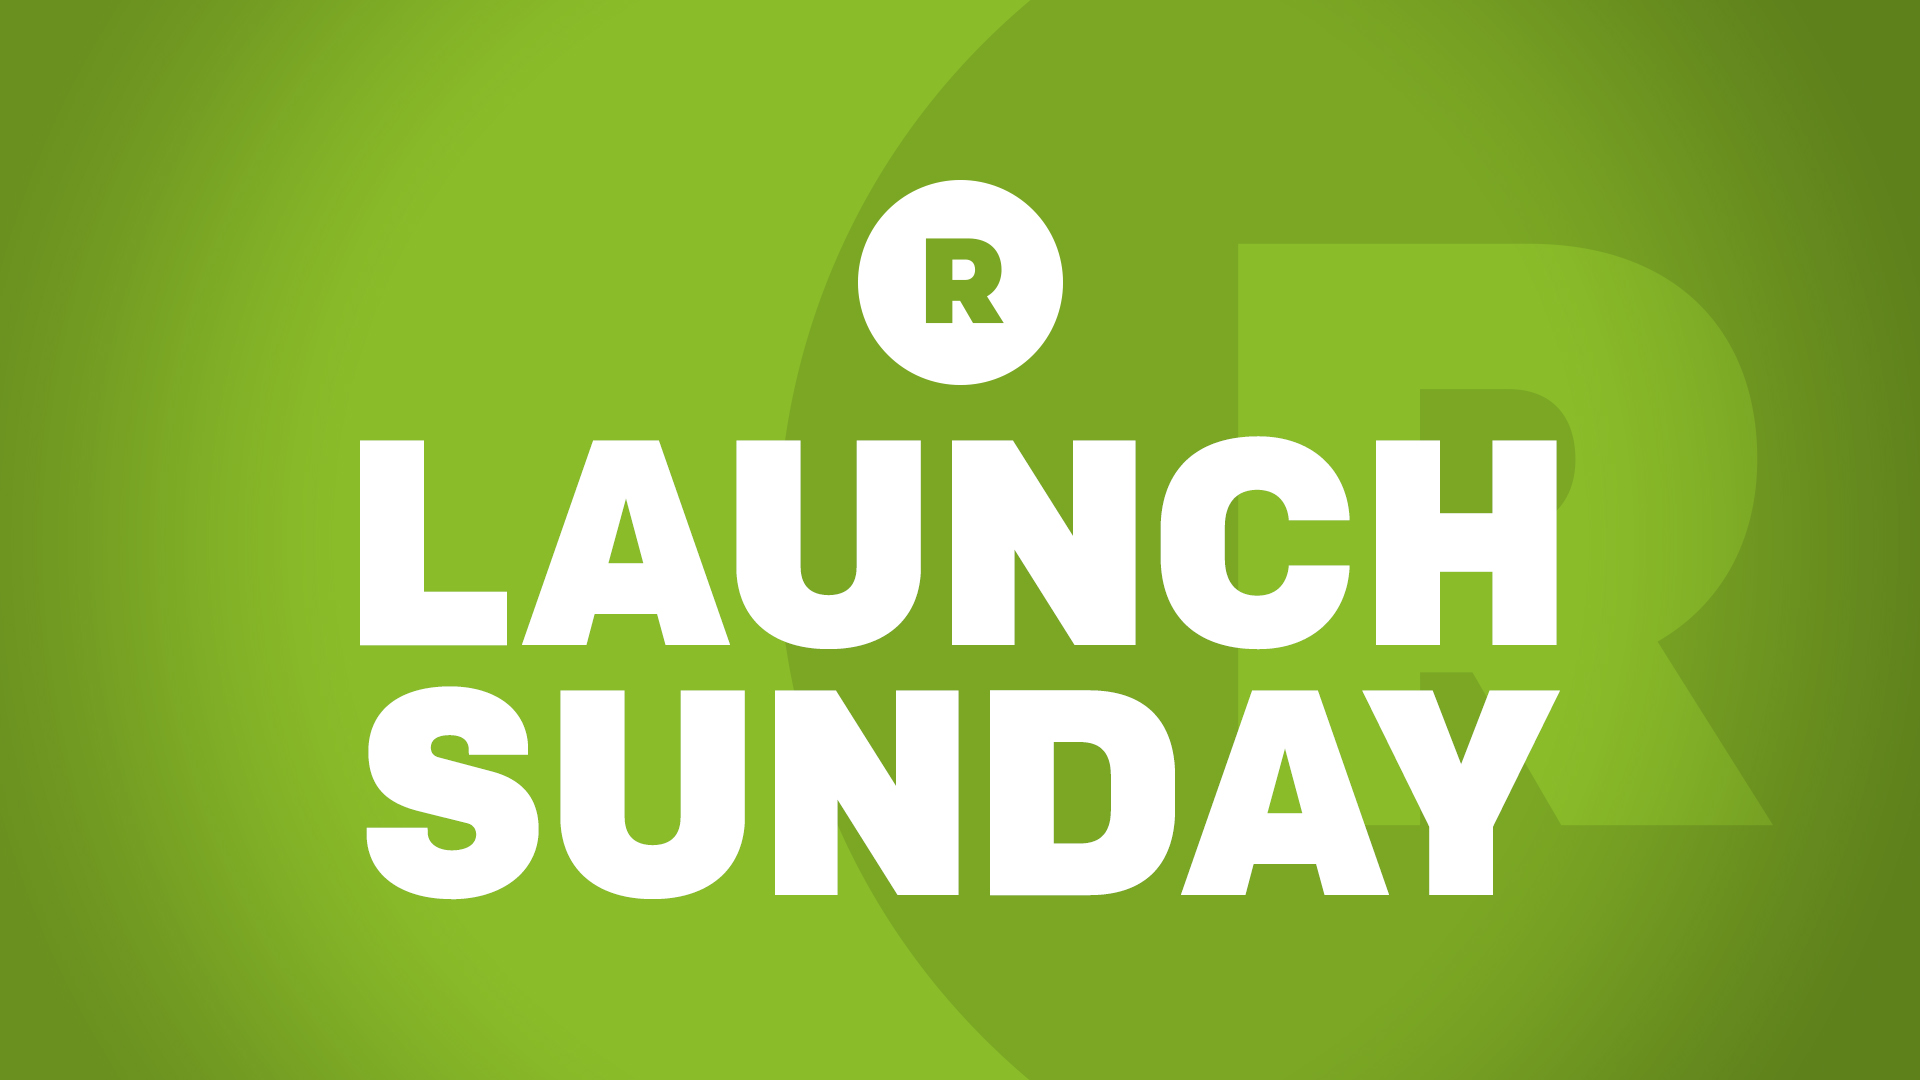 visalia church launch sunday